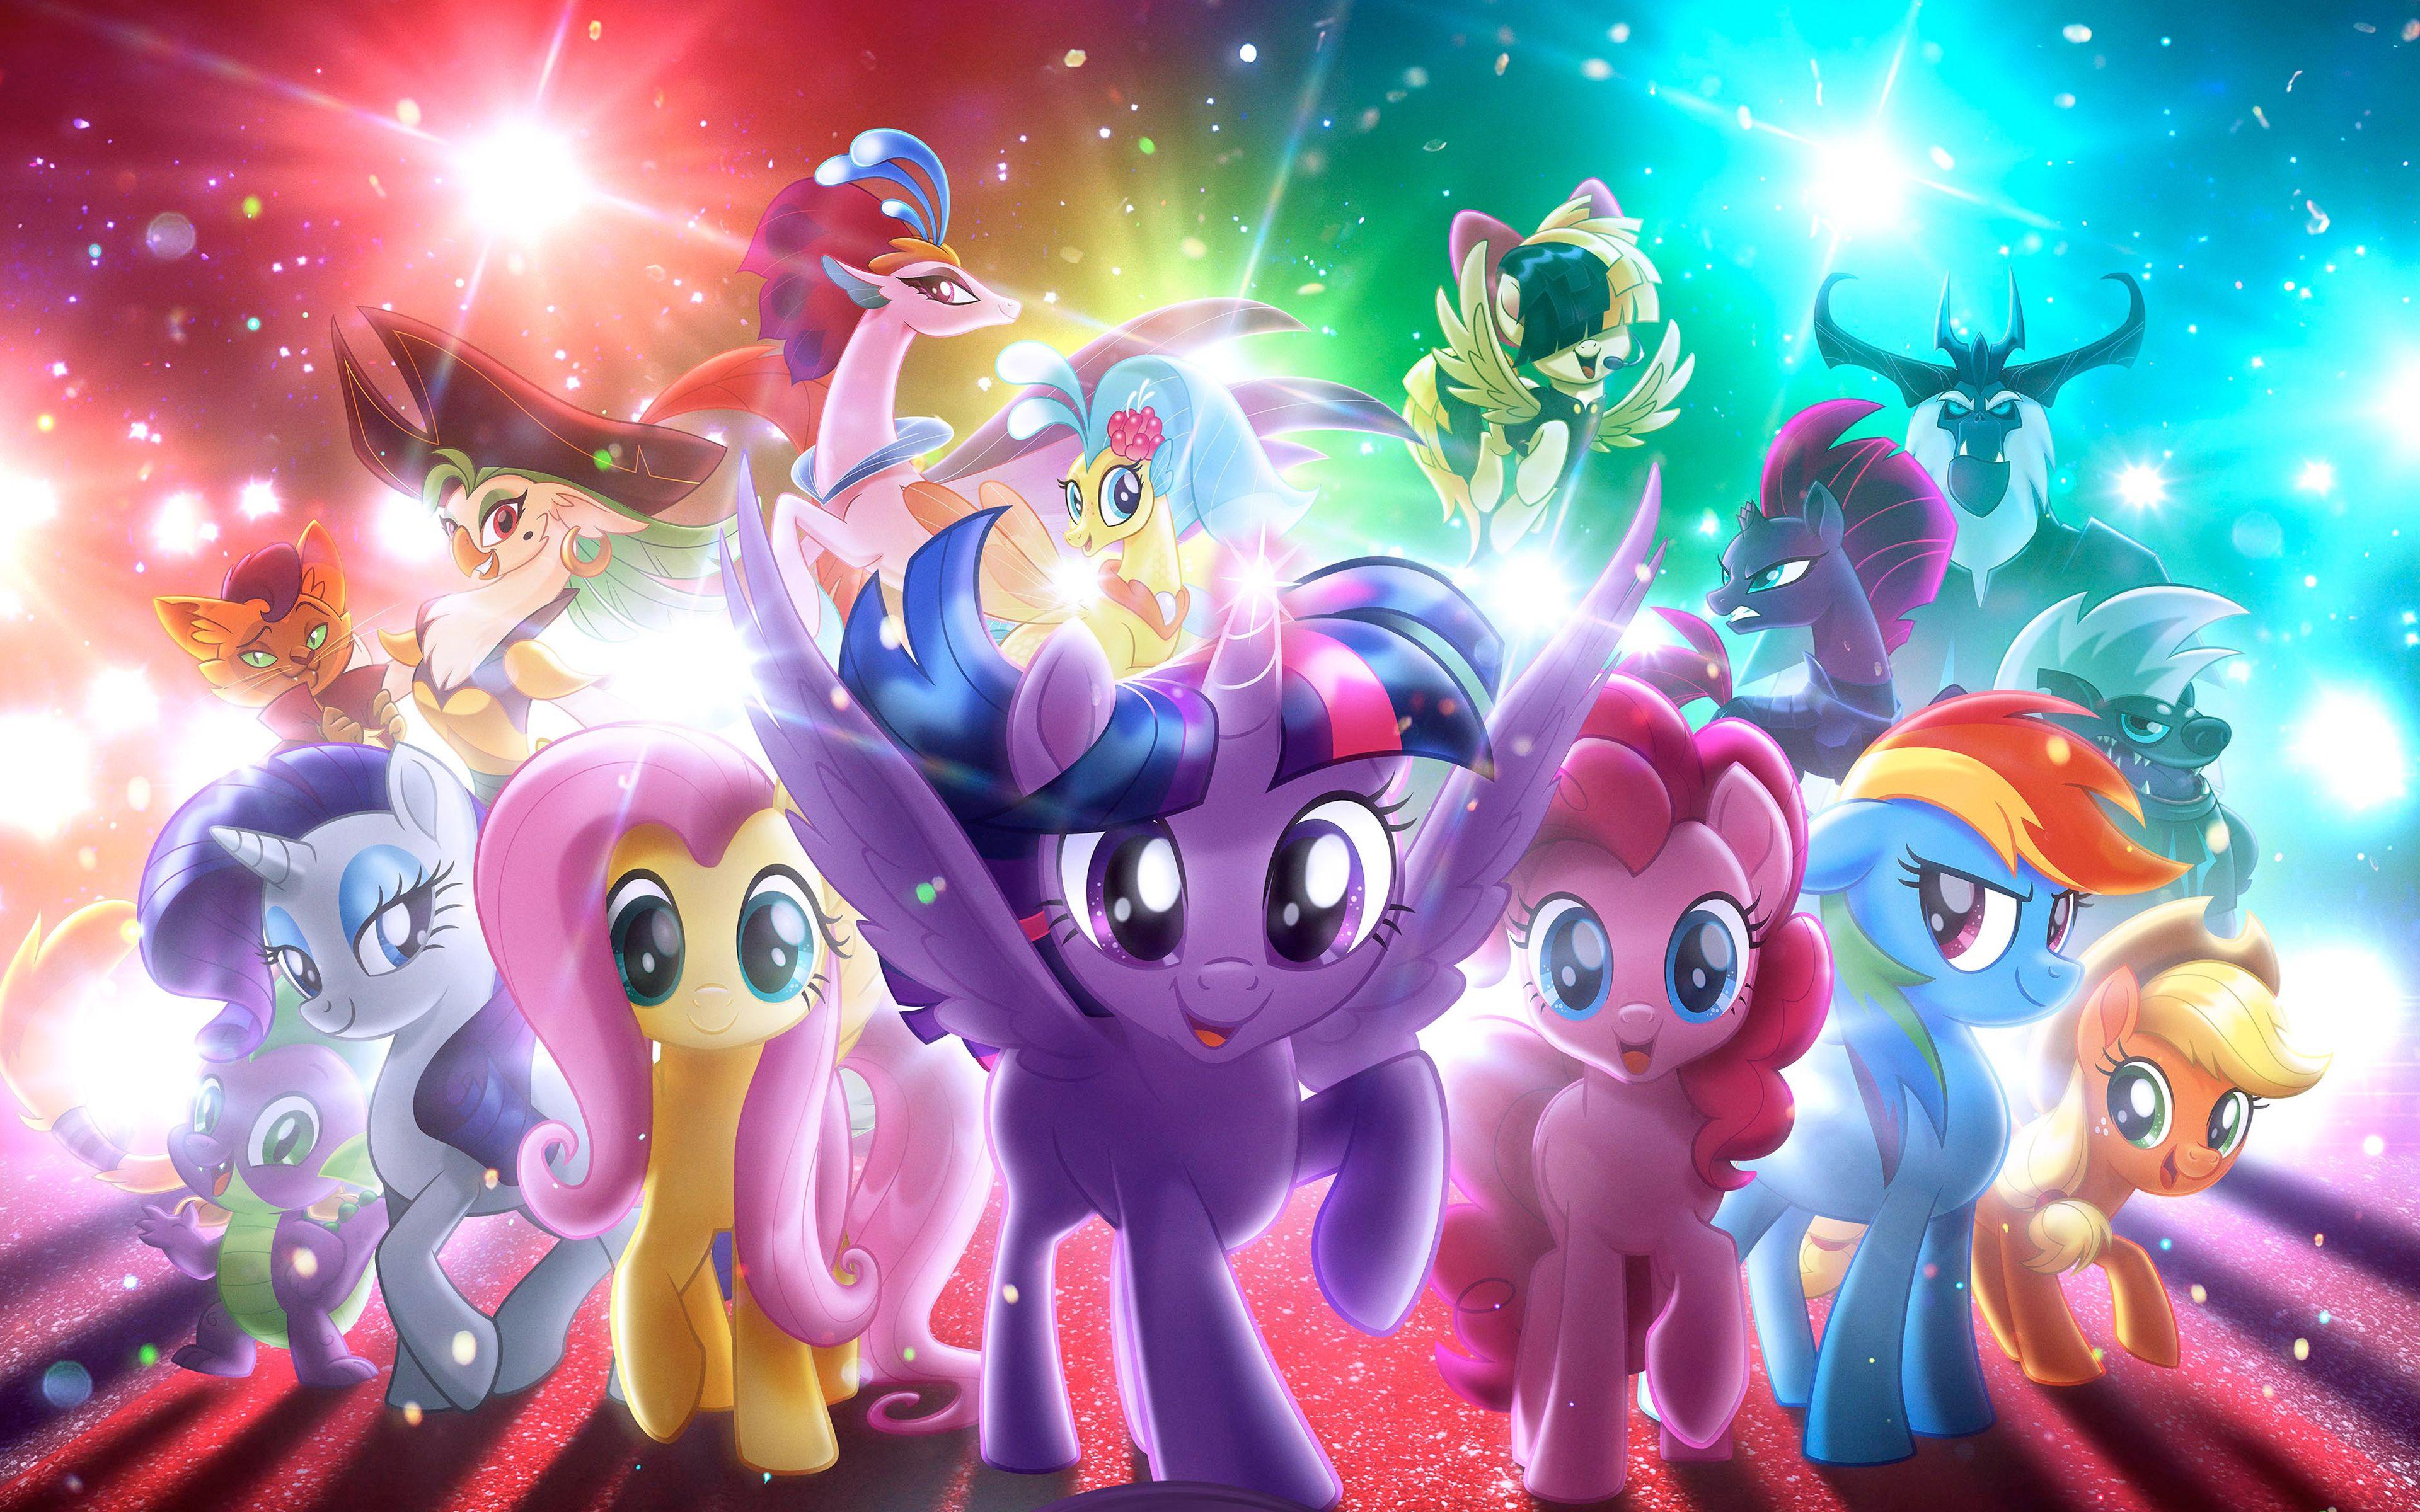 4K My Little Pony Wallpapers   Top 4K My Little Pony 3840x2400